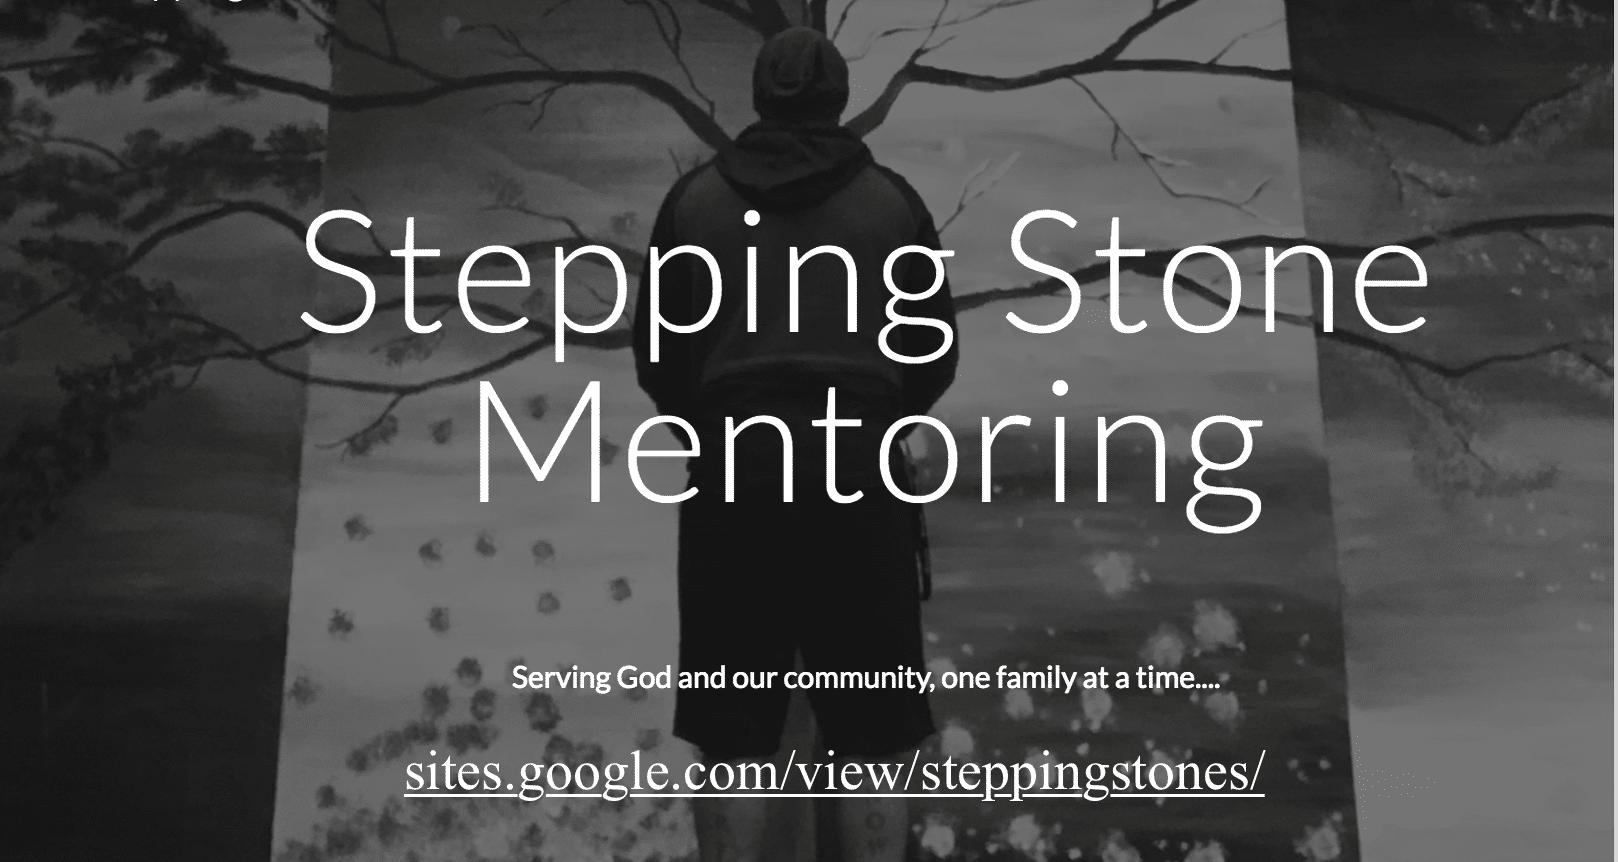 Stepping Stones Mentoring